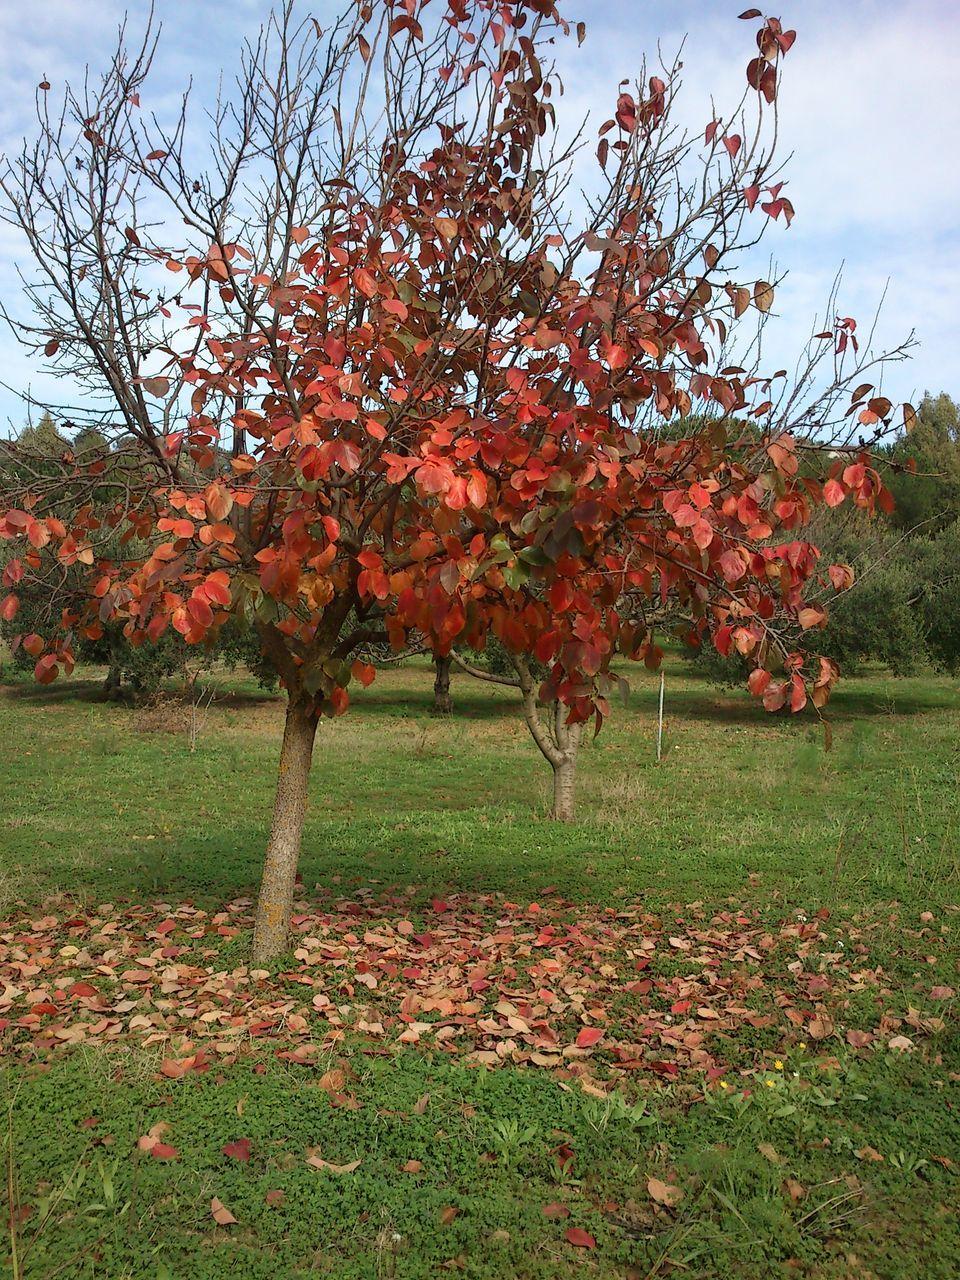 Autumn Tree On Grassy Field Against Sky